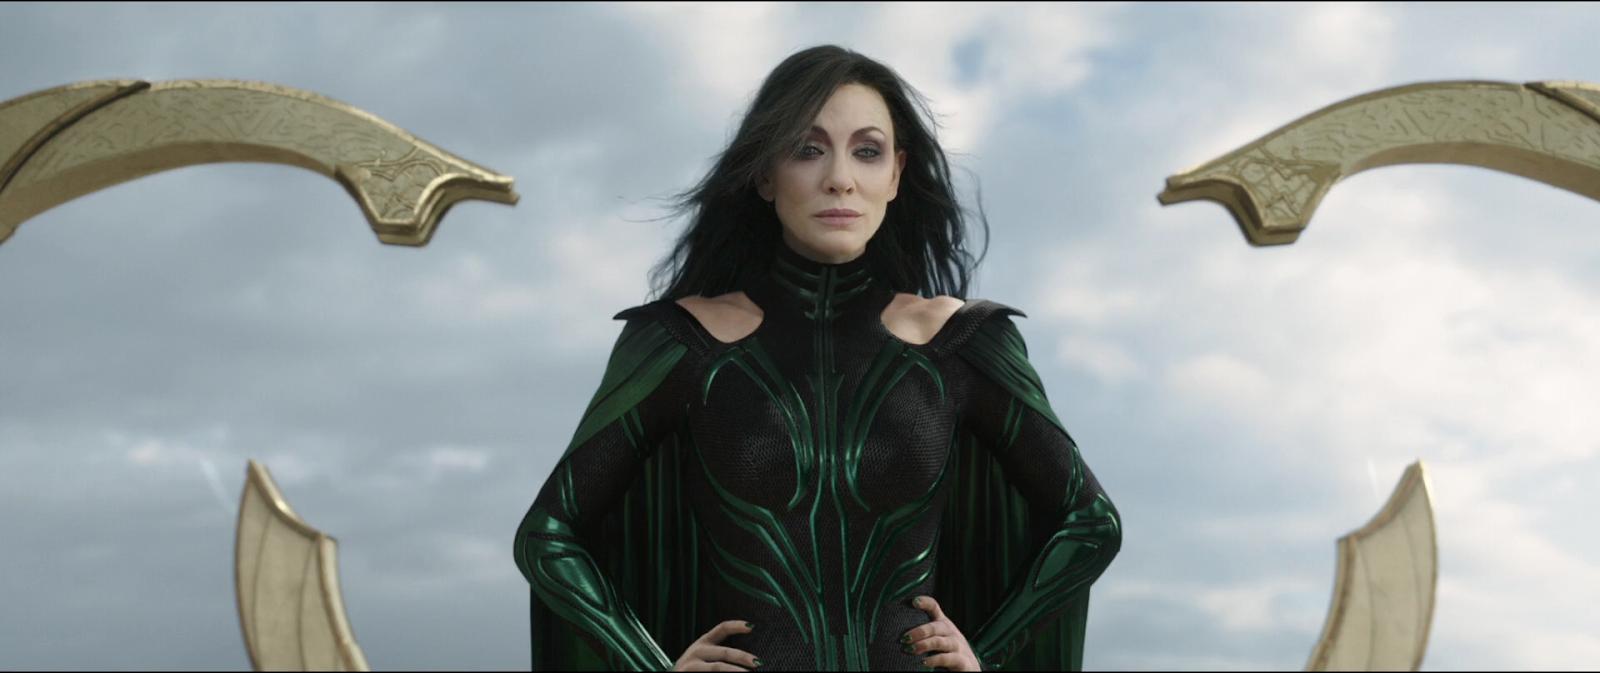 Thor: Ragnarok (2017) BRRip 1080p Latino-Ingles captura 4